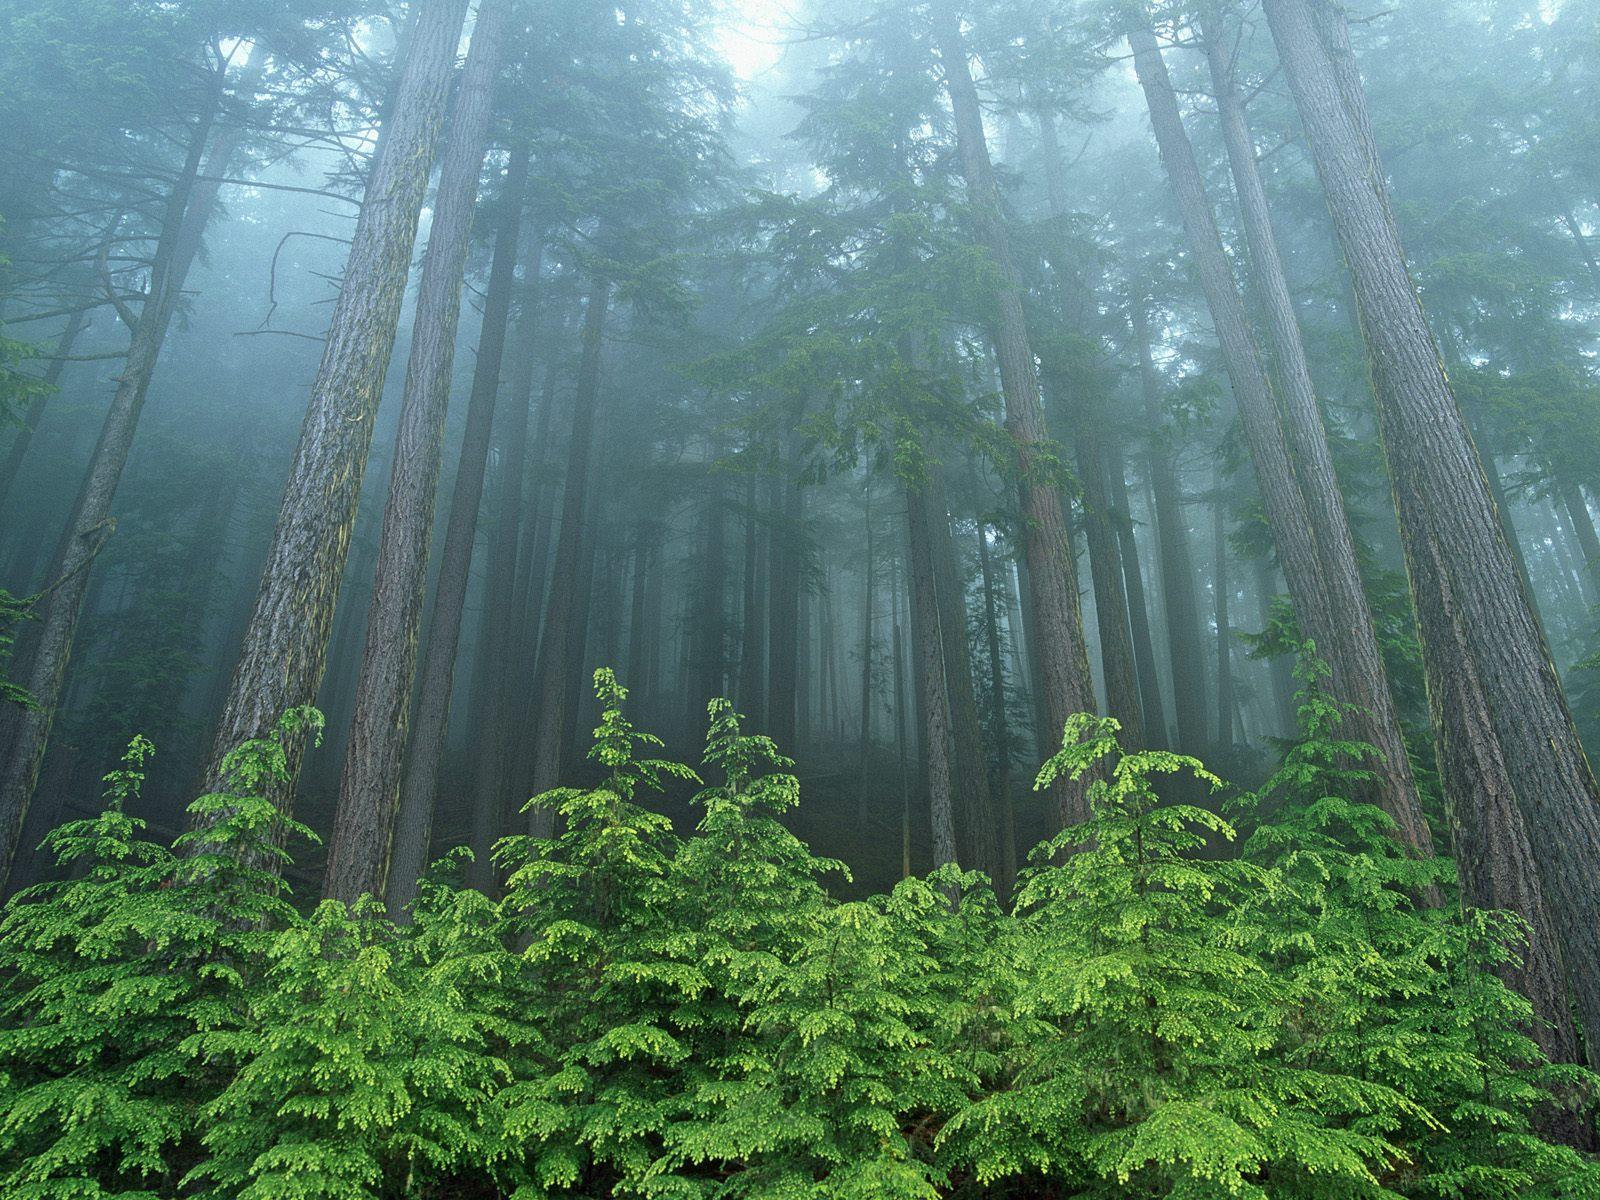 The mist shrouded woods